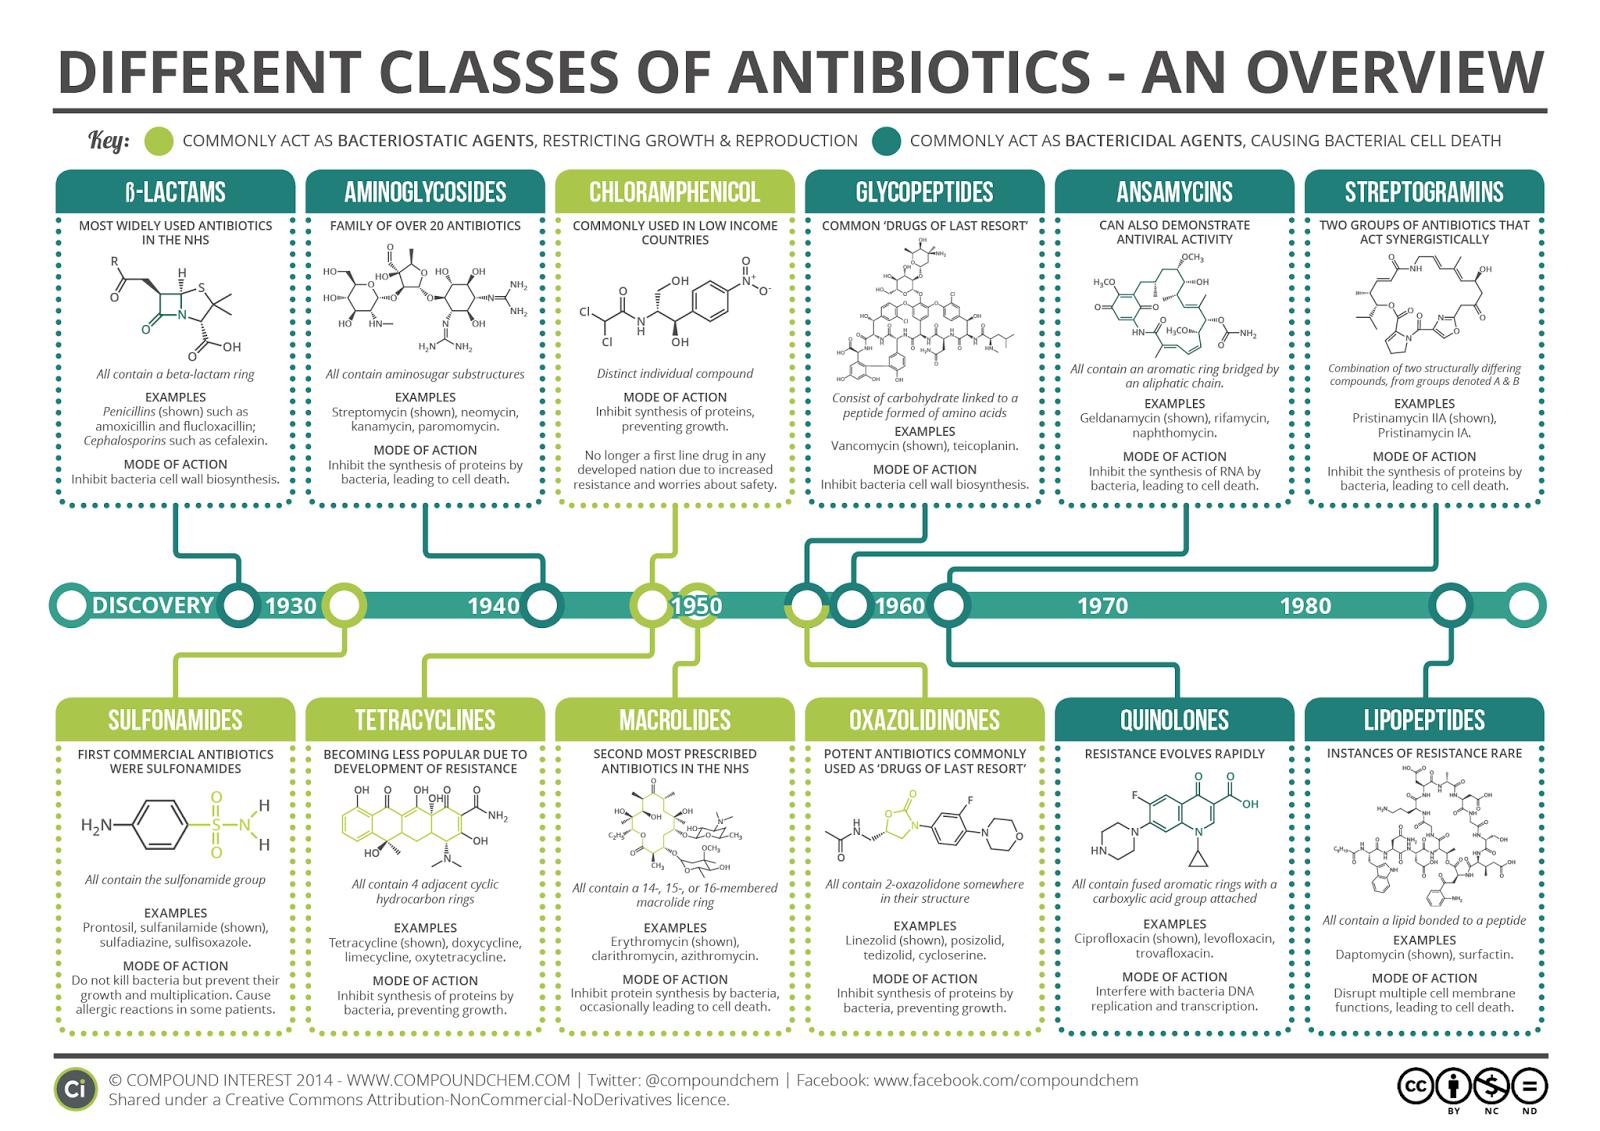 beta-lactams aminoglycosides chloramphenicol clycopeptides ansamycins